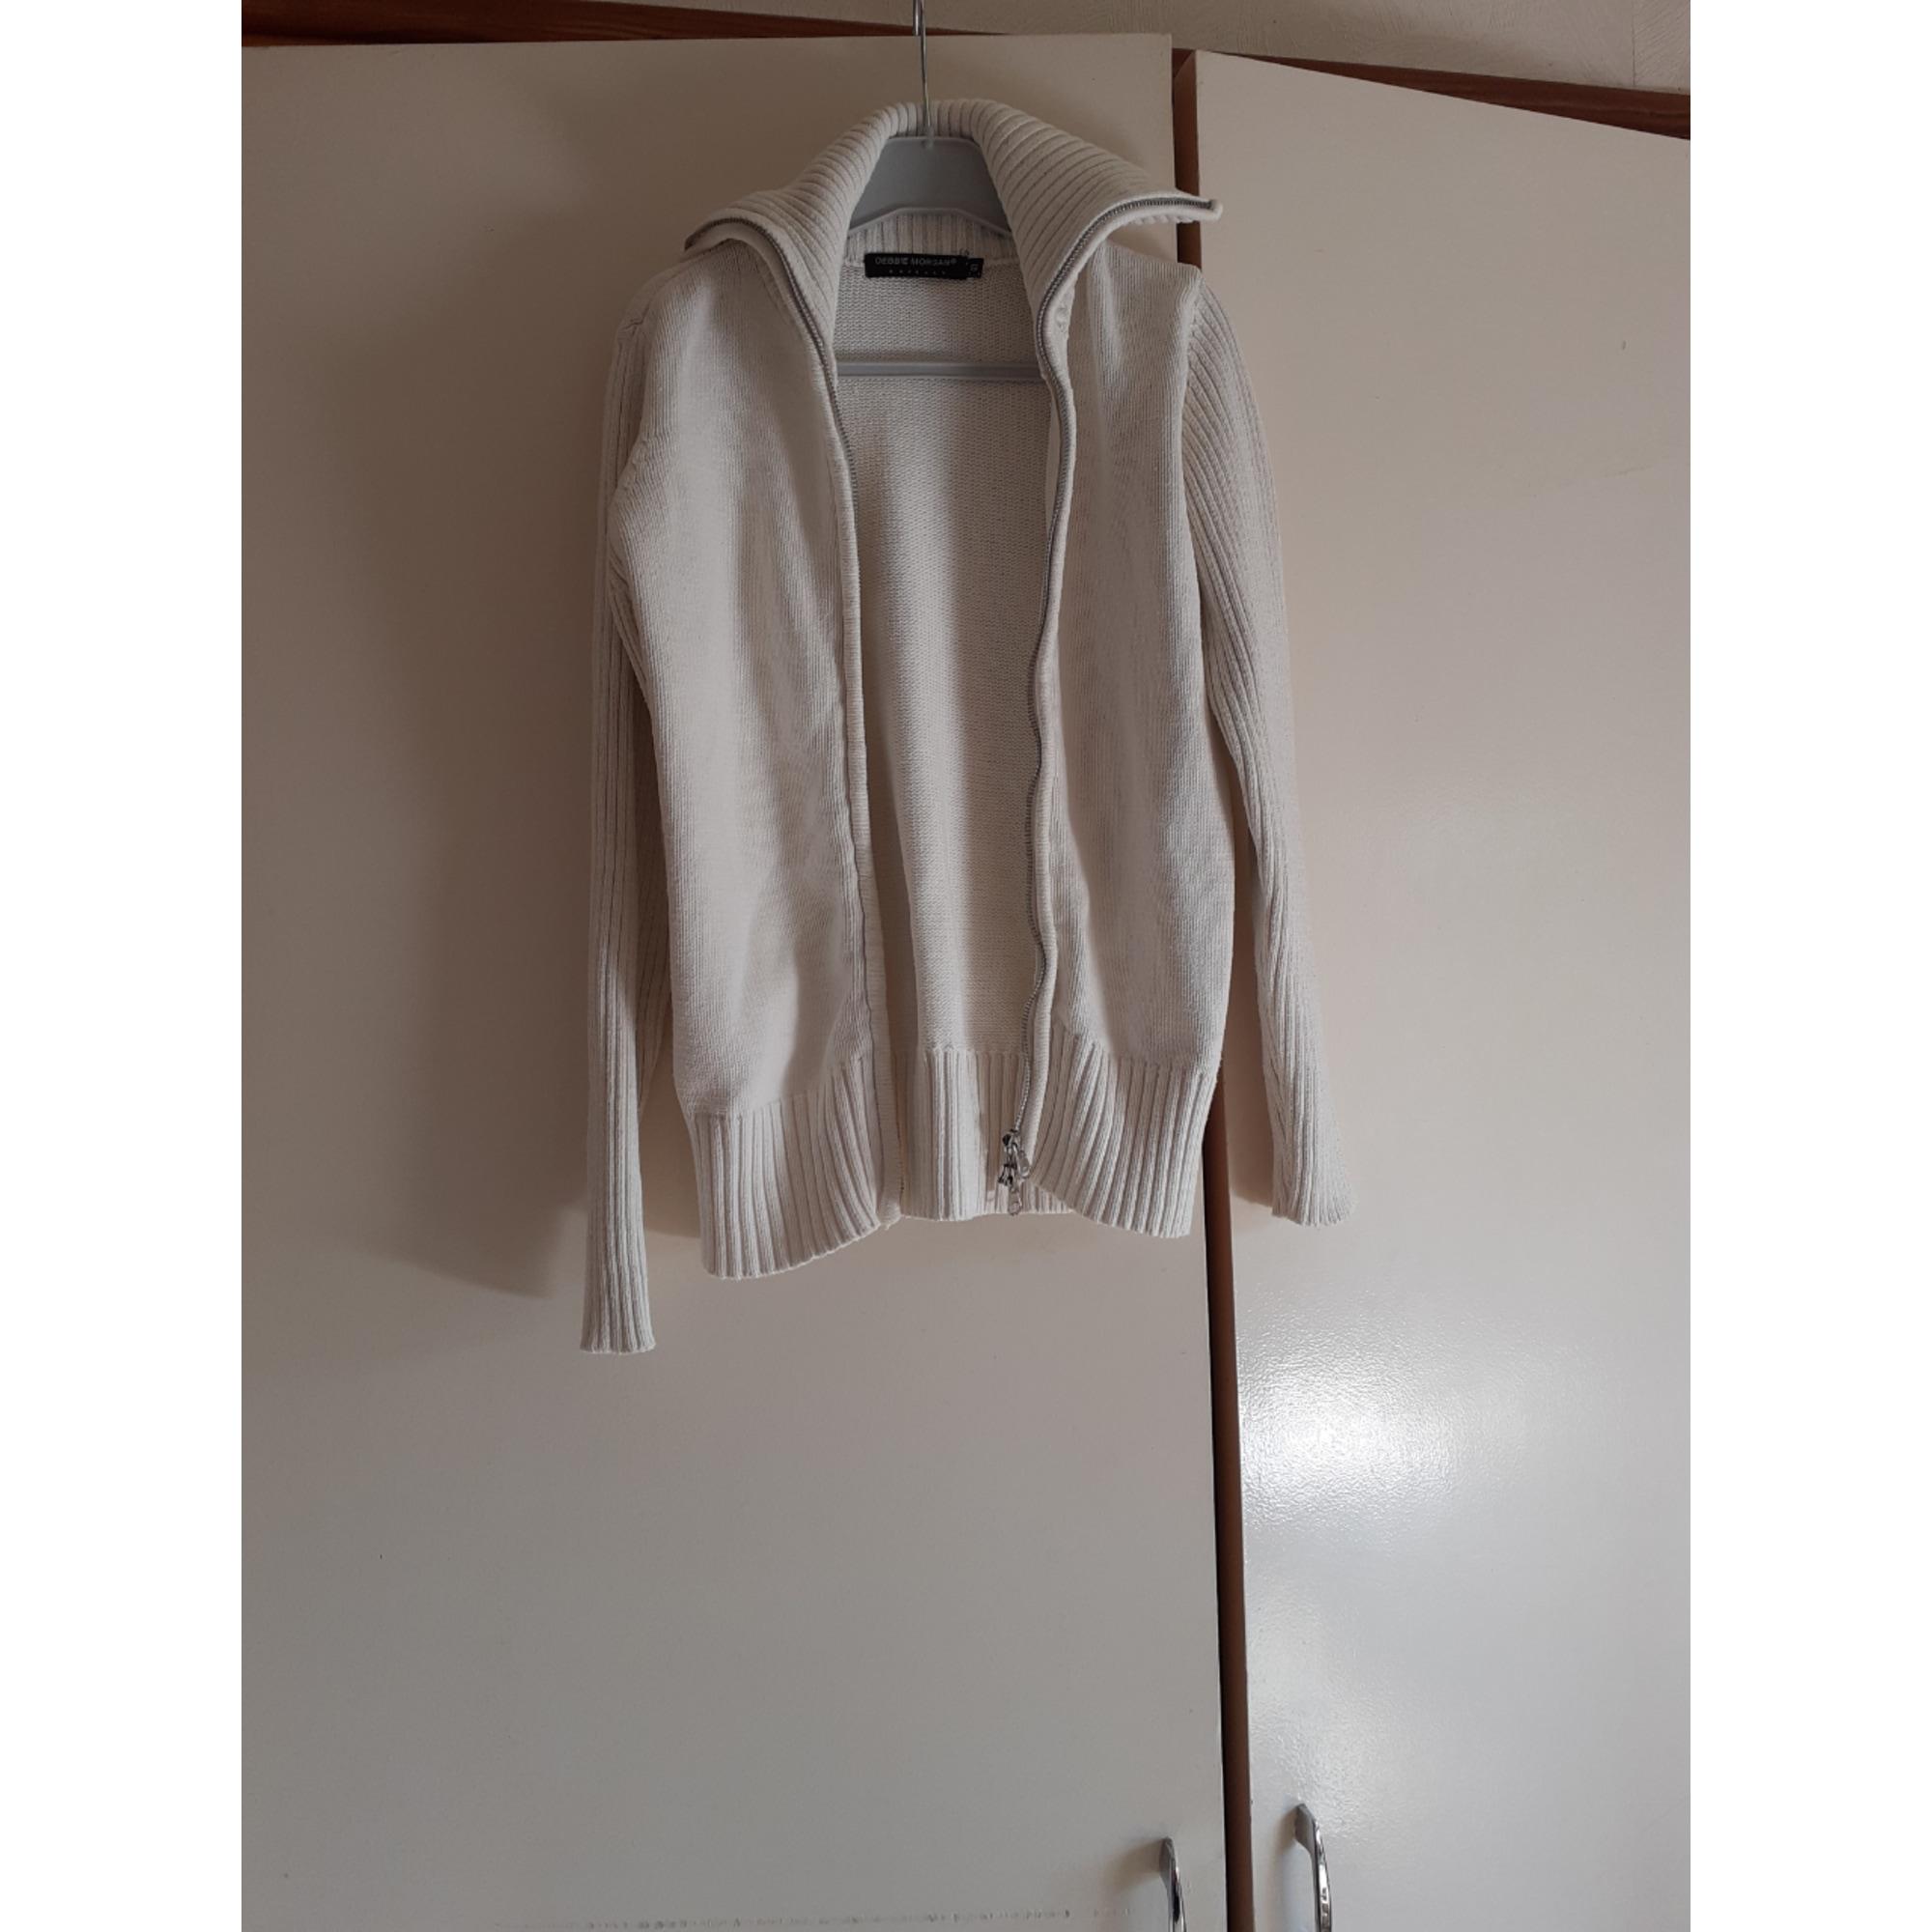 Gilet, cardigan DEBBIE MORGAN Blanc, blanc cassé, écru